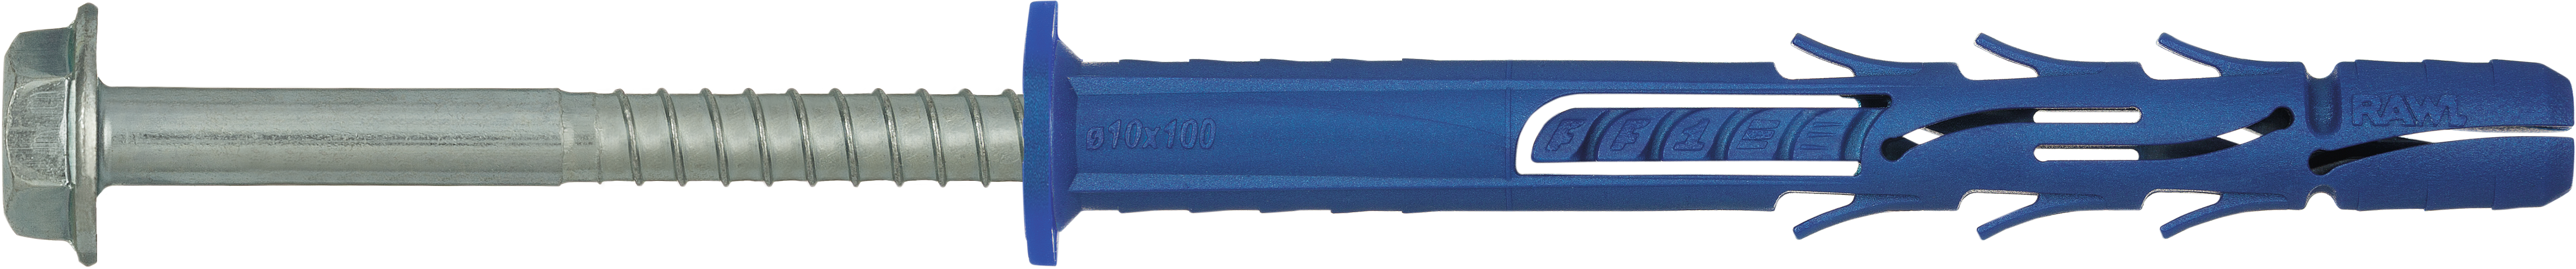 R-FF1-K Fasadplugg Nylon med krage sexkantsskruv - elförzinkad